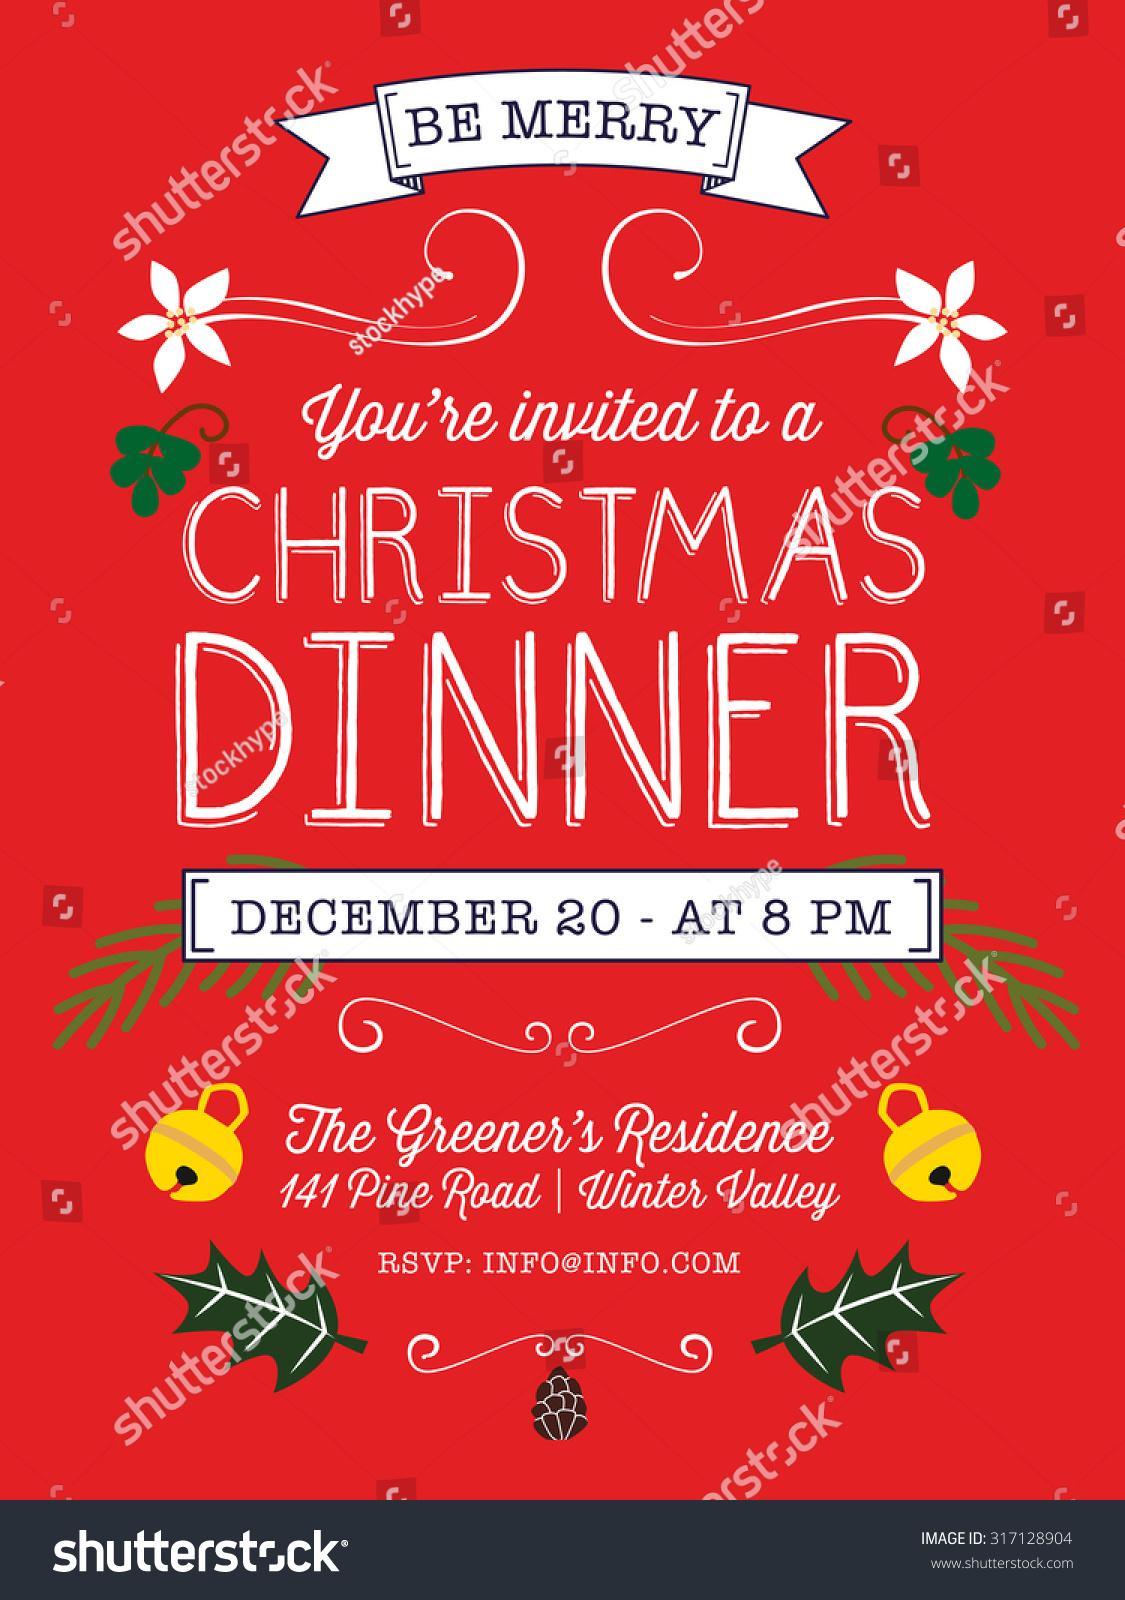 Christmas Dinner Invitation Flyer On Red Stock Vector (Royalty Free ...